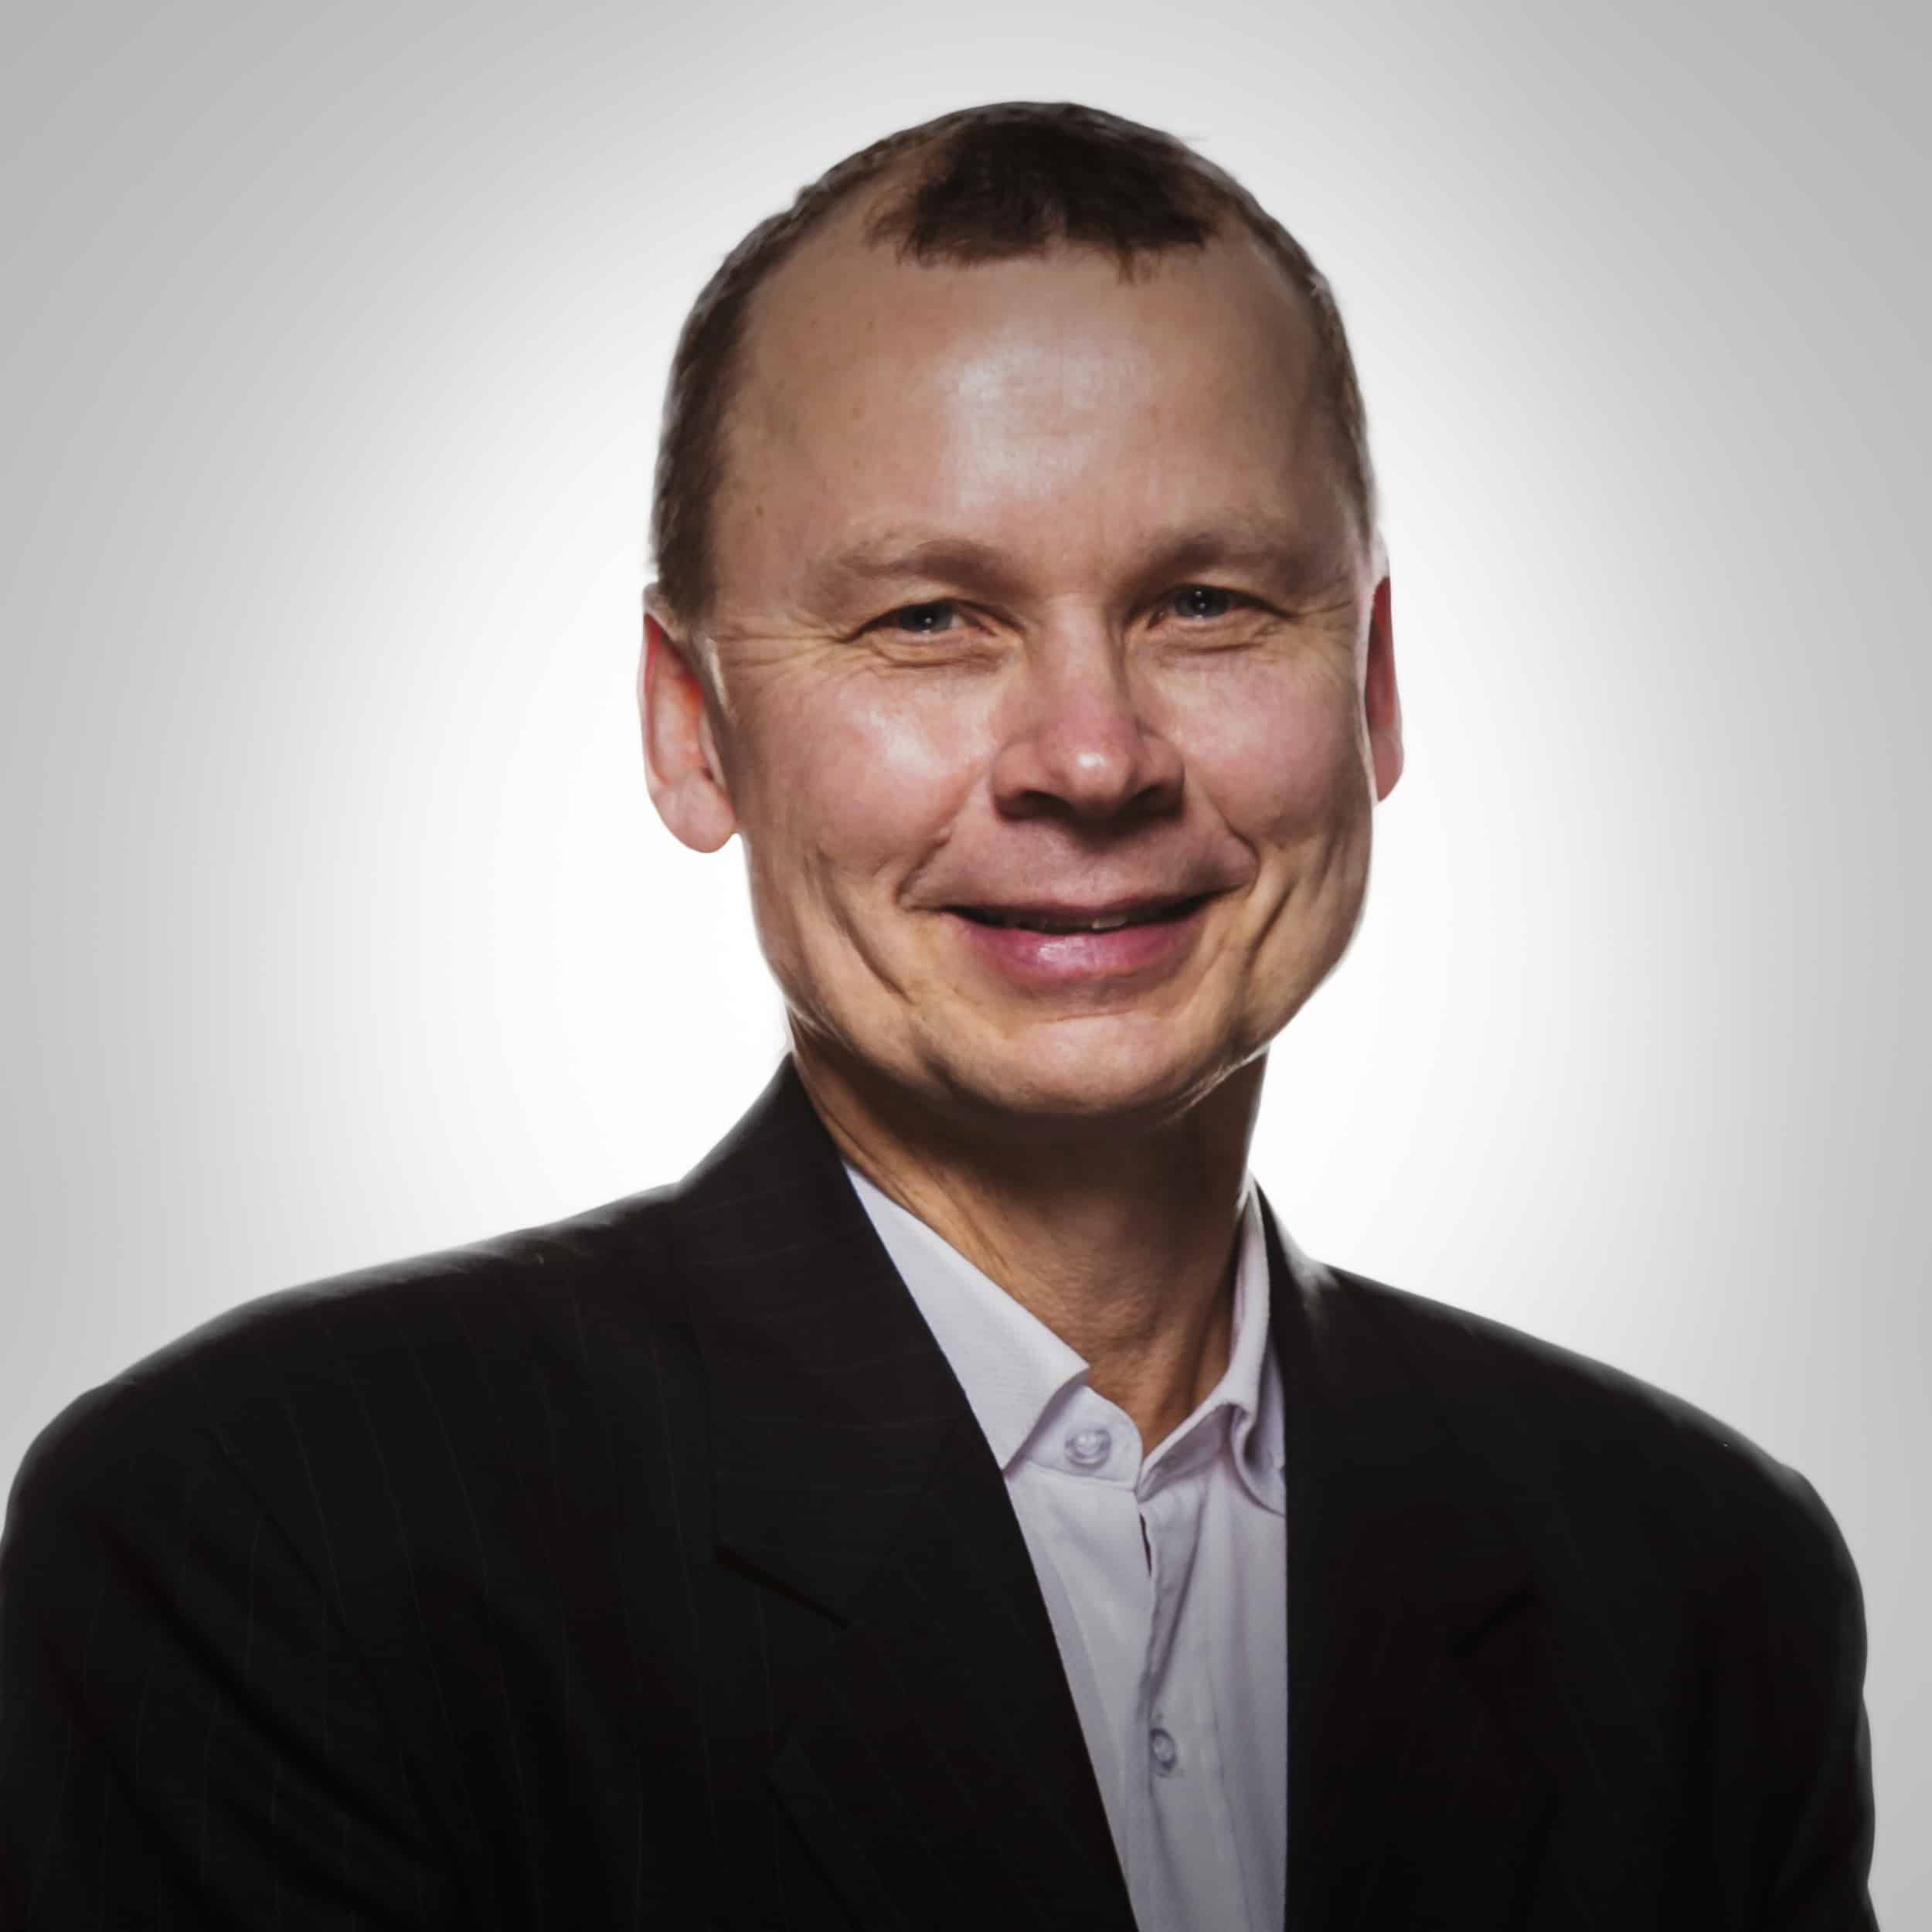 Antti Kaunonen appointed as Kalmar president